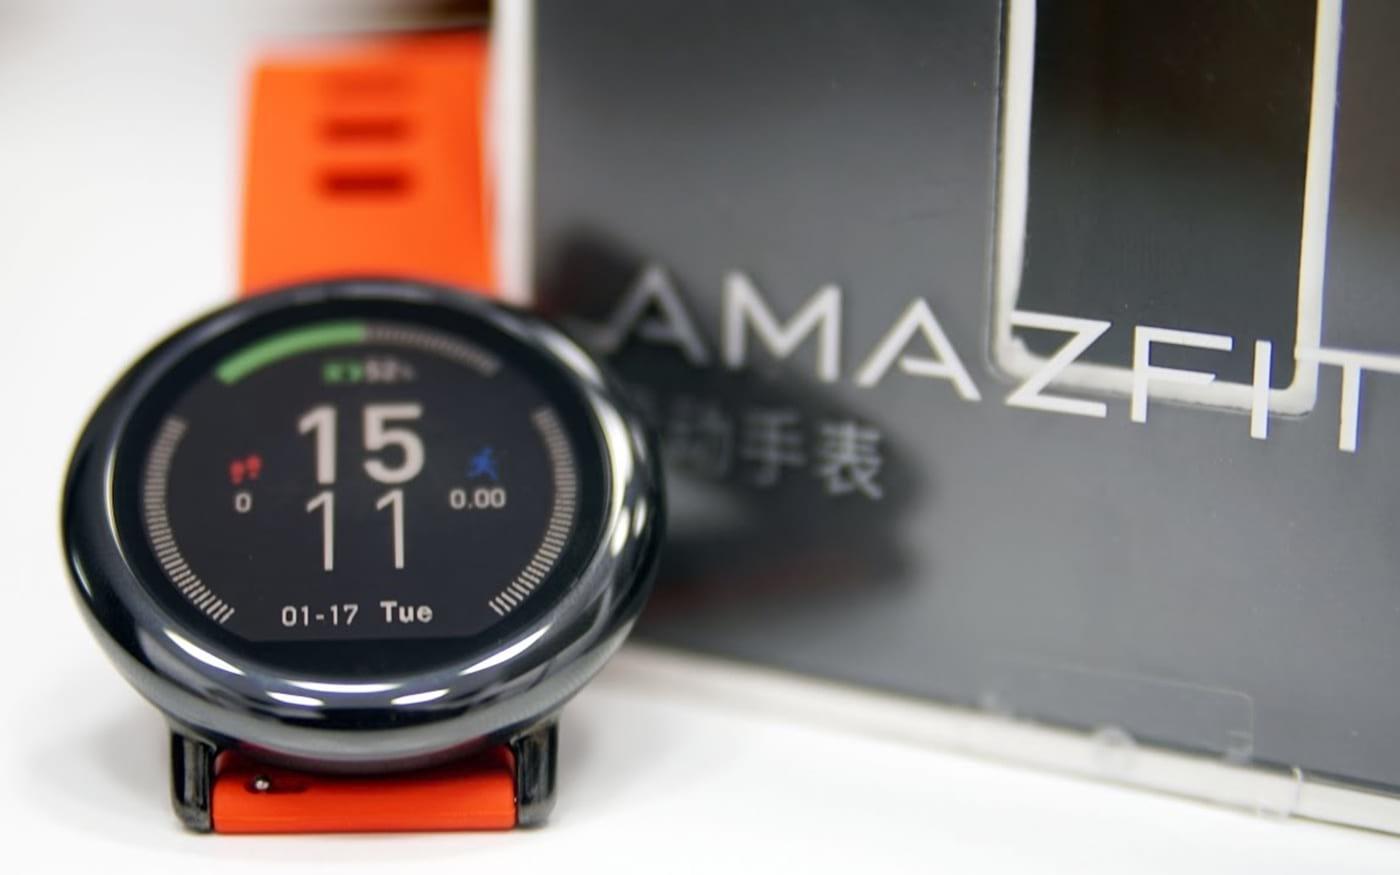 Loja online da Xiaomi vende o smartwatch Amazfit Pace no Brasil